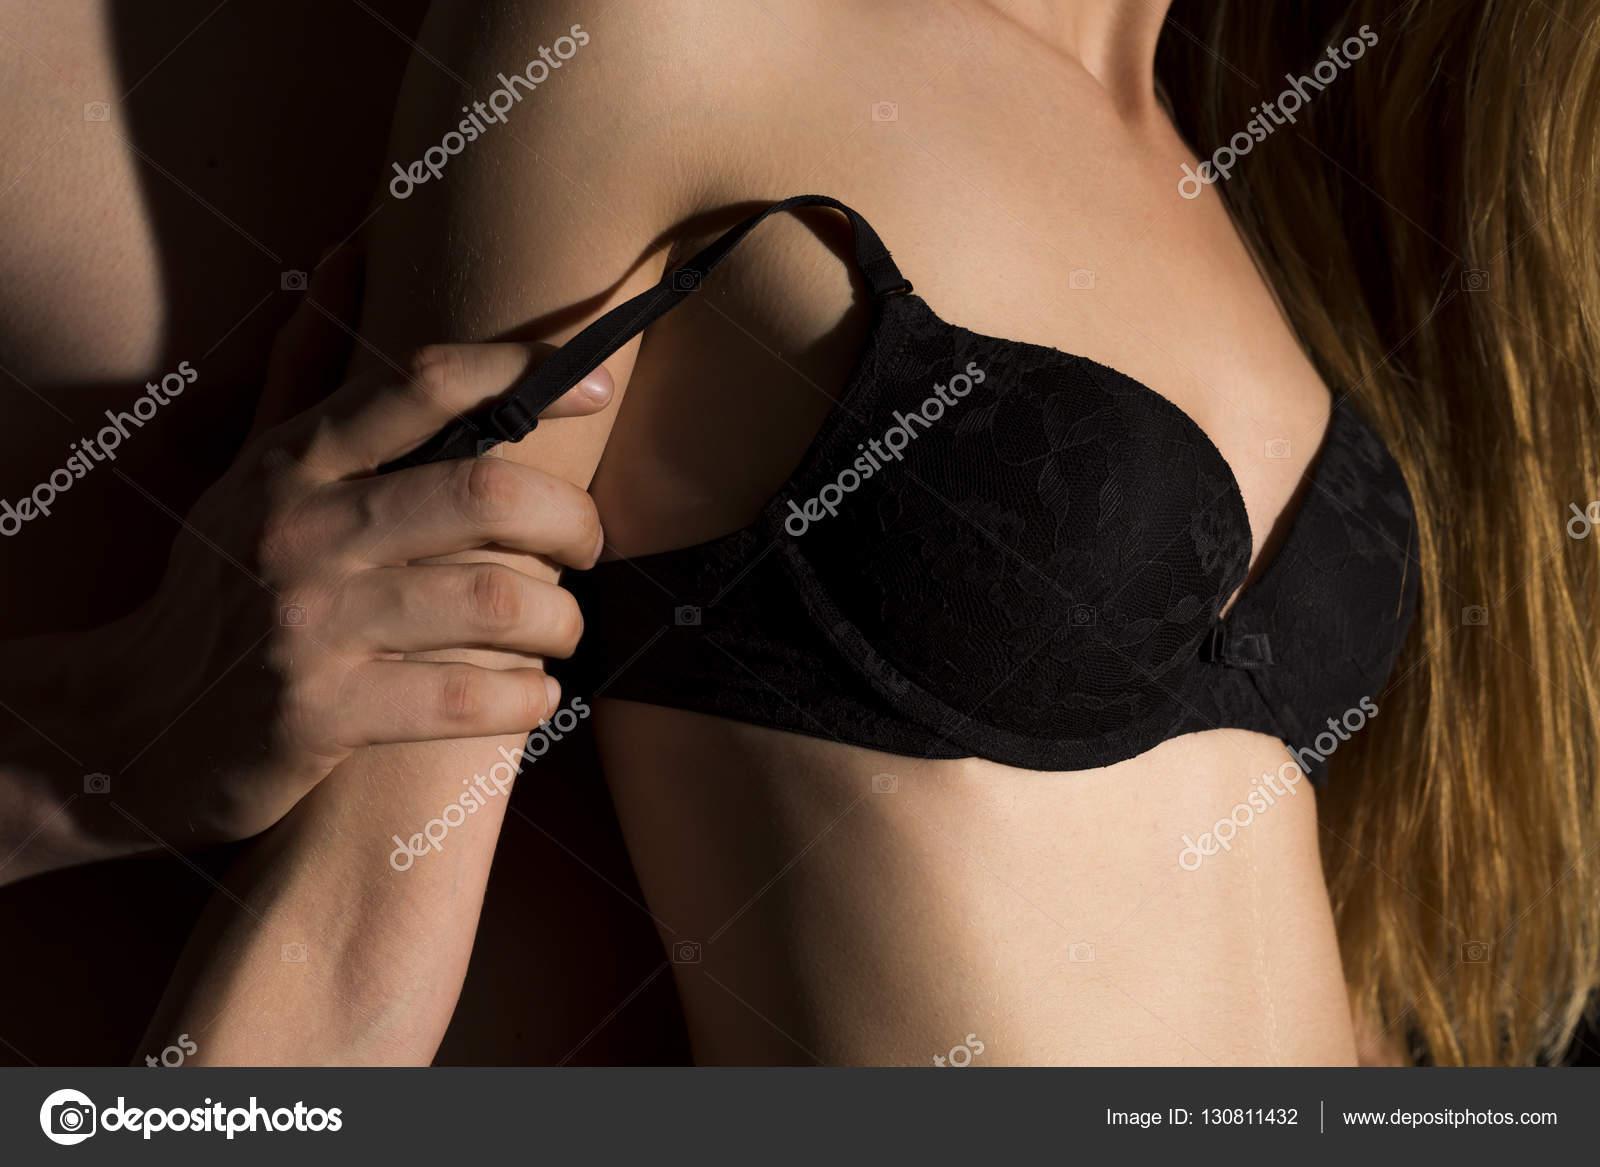 man undressing woman